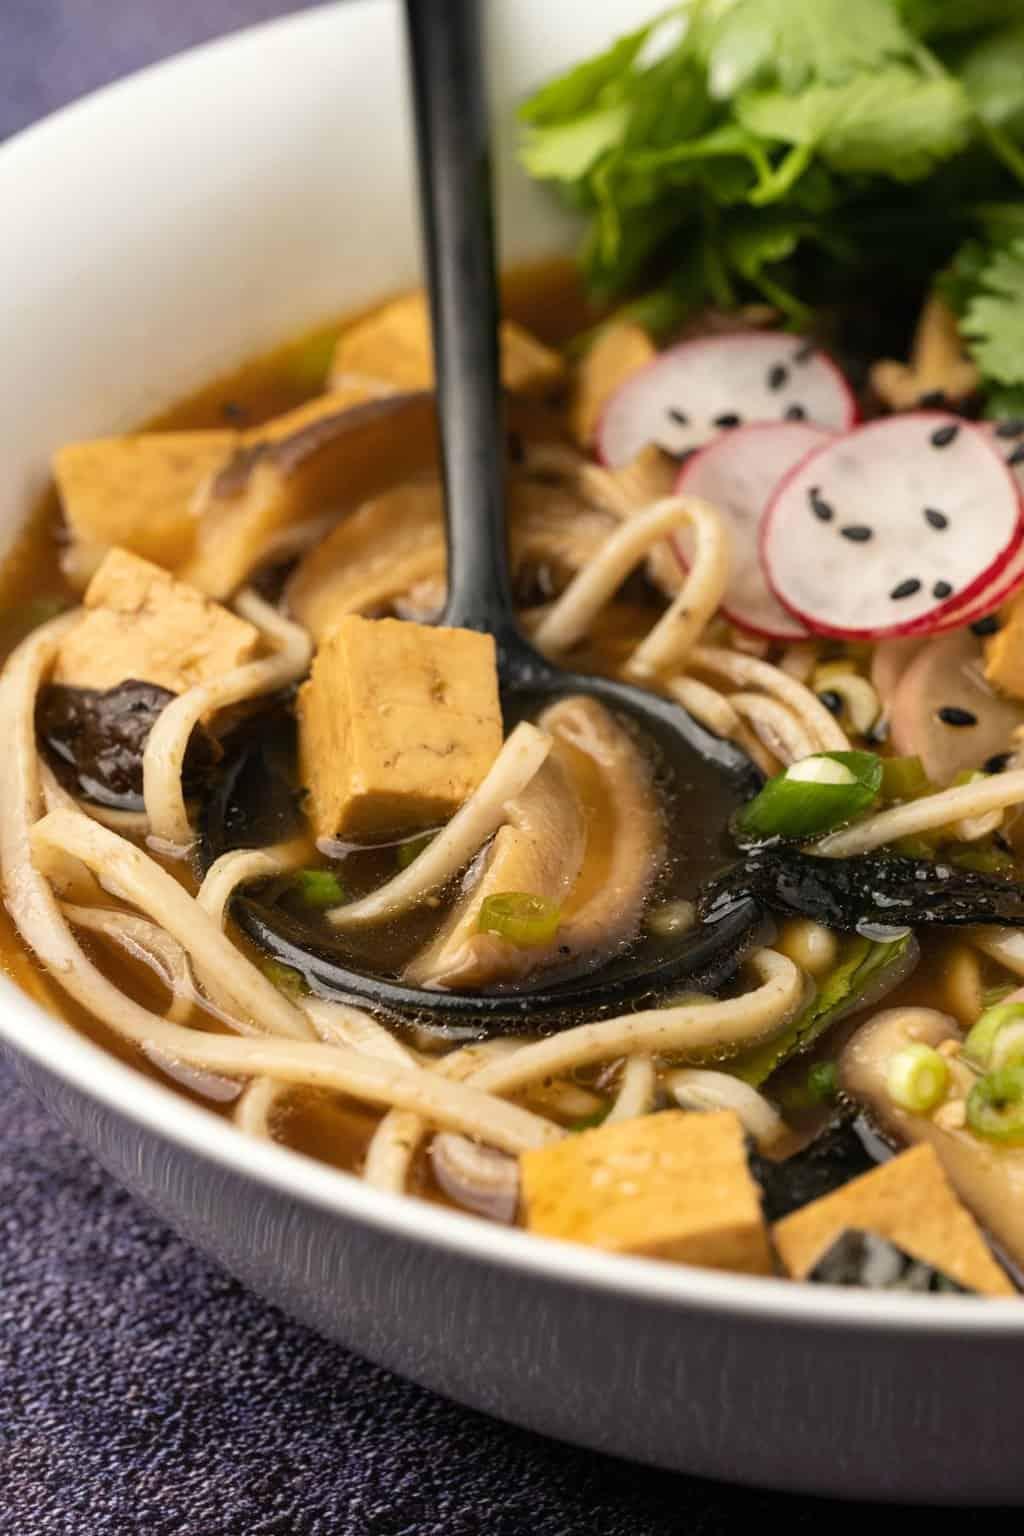 Vegan ramen in a white bowl with a black spoon.